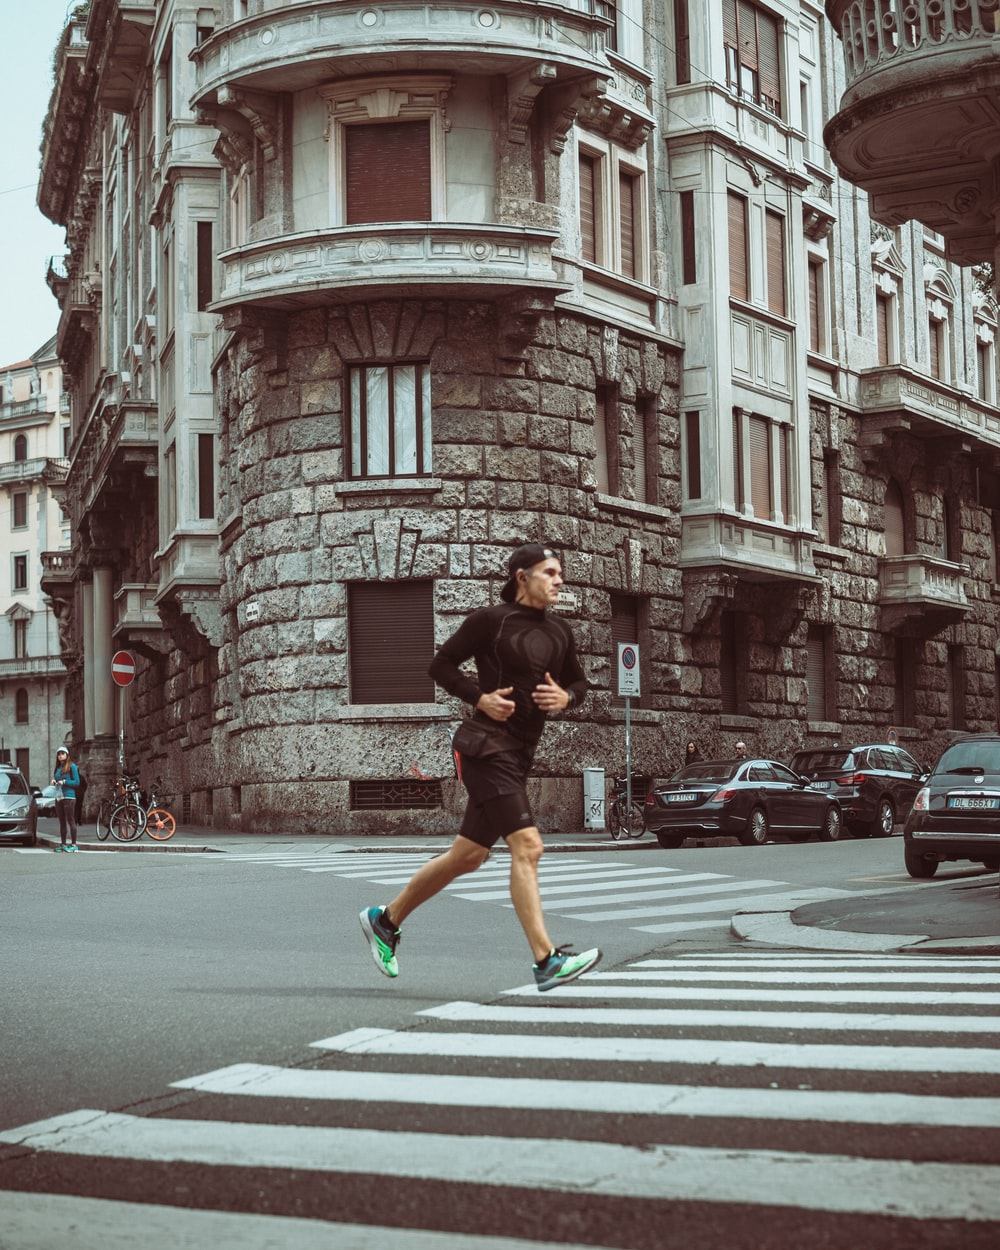 man in black t-shirt and green shorts running on pedestrian lane during daytime